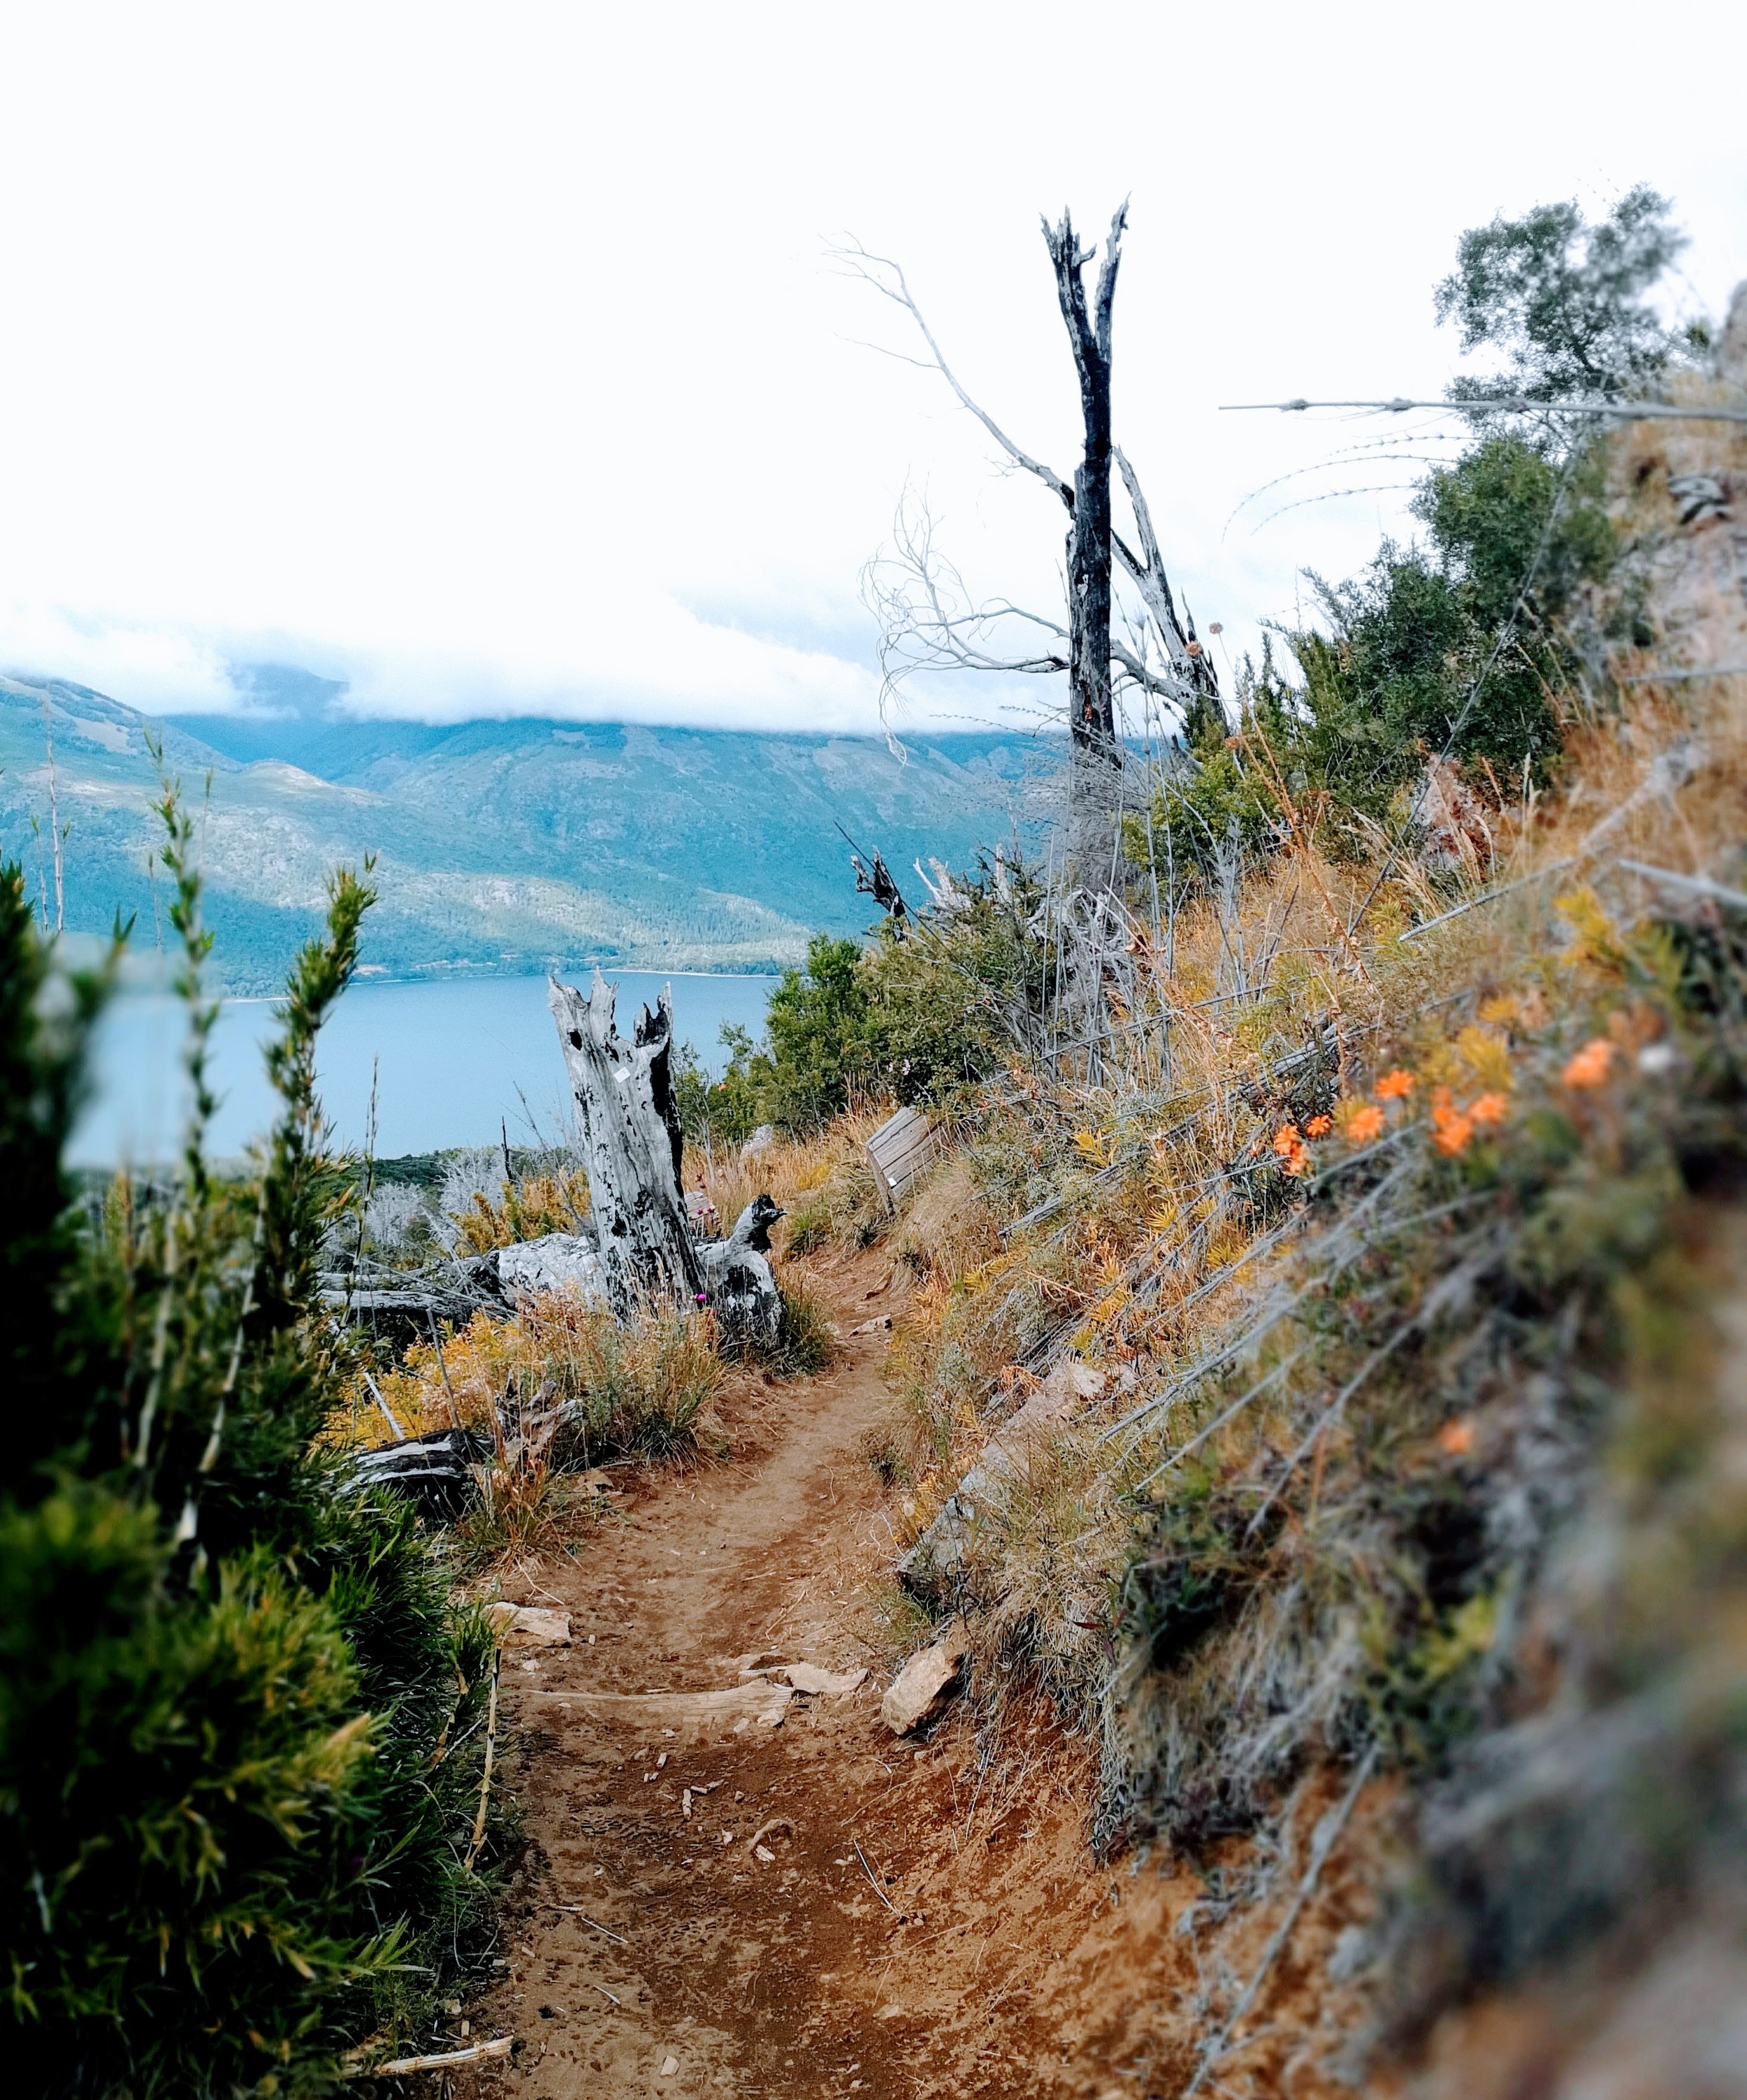 refugio frey bariloche hiking hike guide free argentina patagonia trail lake spring summer